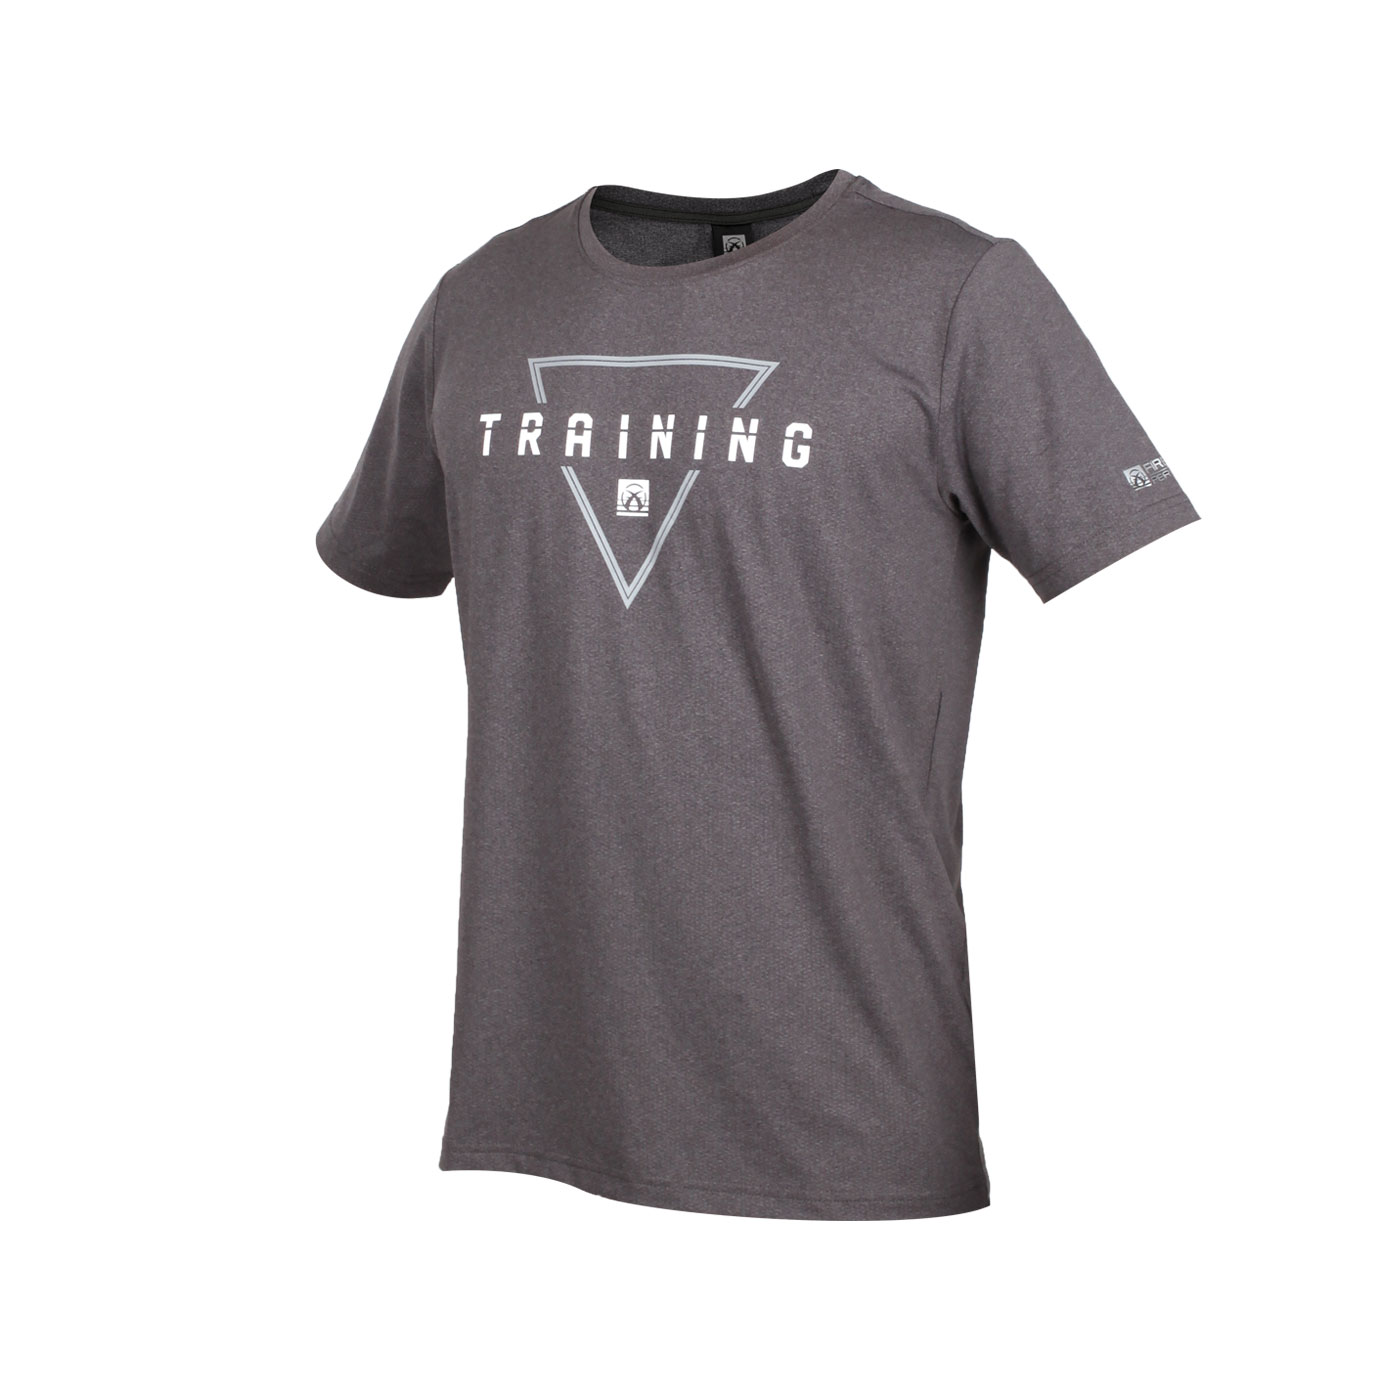 FIRESTAR 男款彈性印花圓領短袖T恤 D0537-18 - 麻花灰白